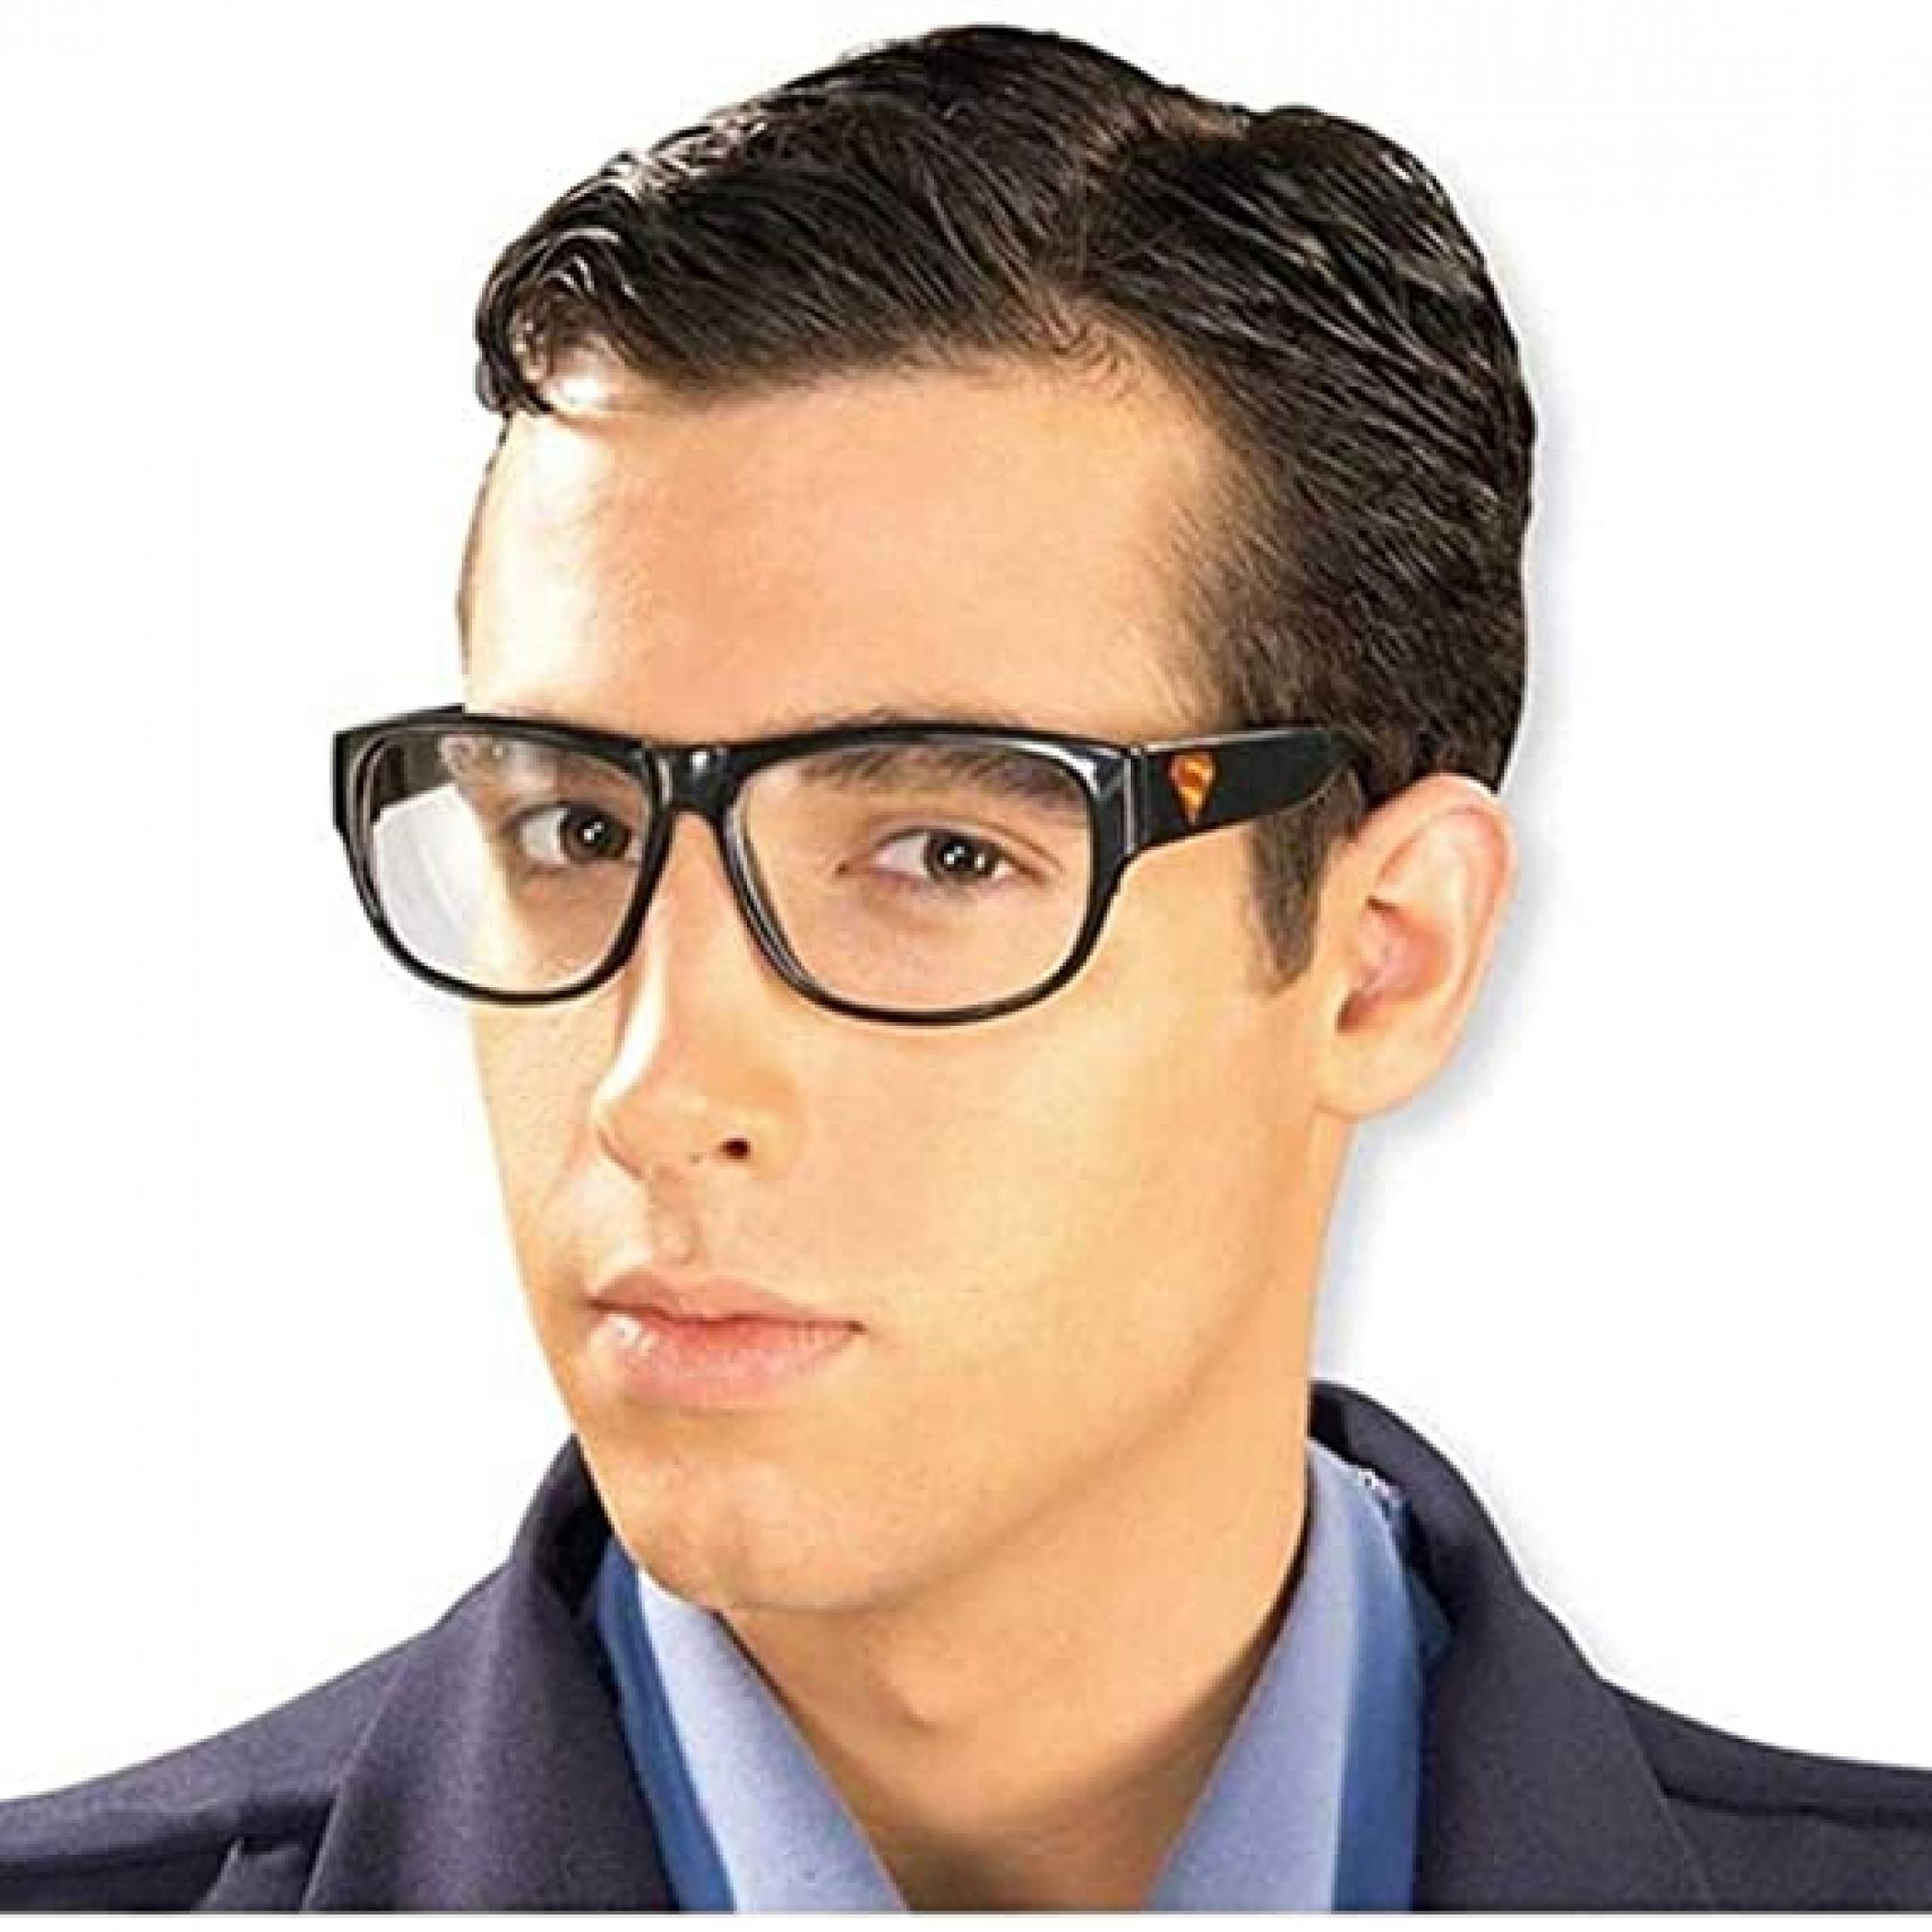 Superman Clark Kent Costume Glasses with Superman Symbol